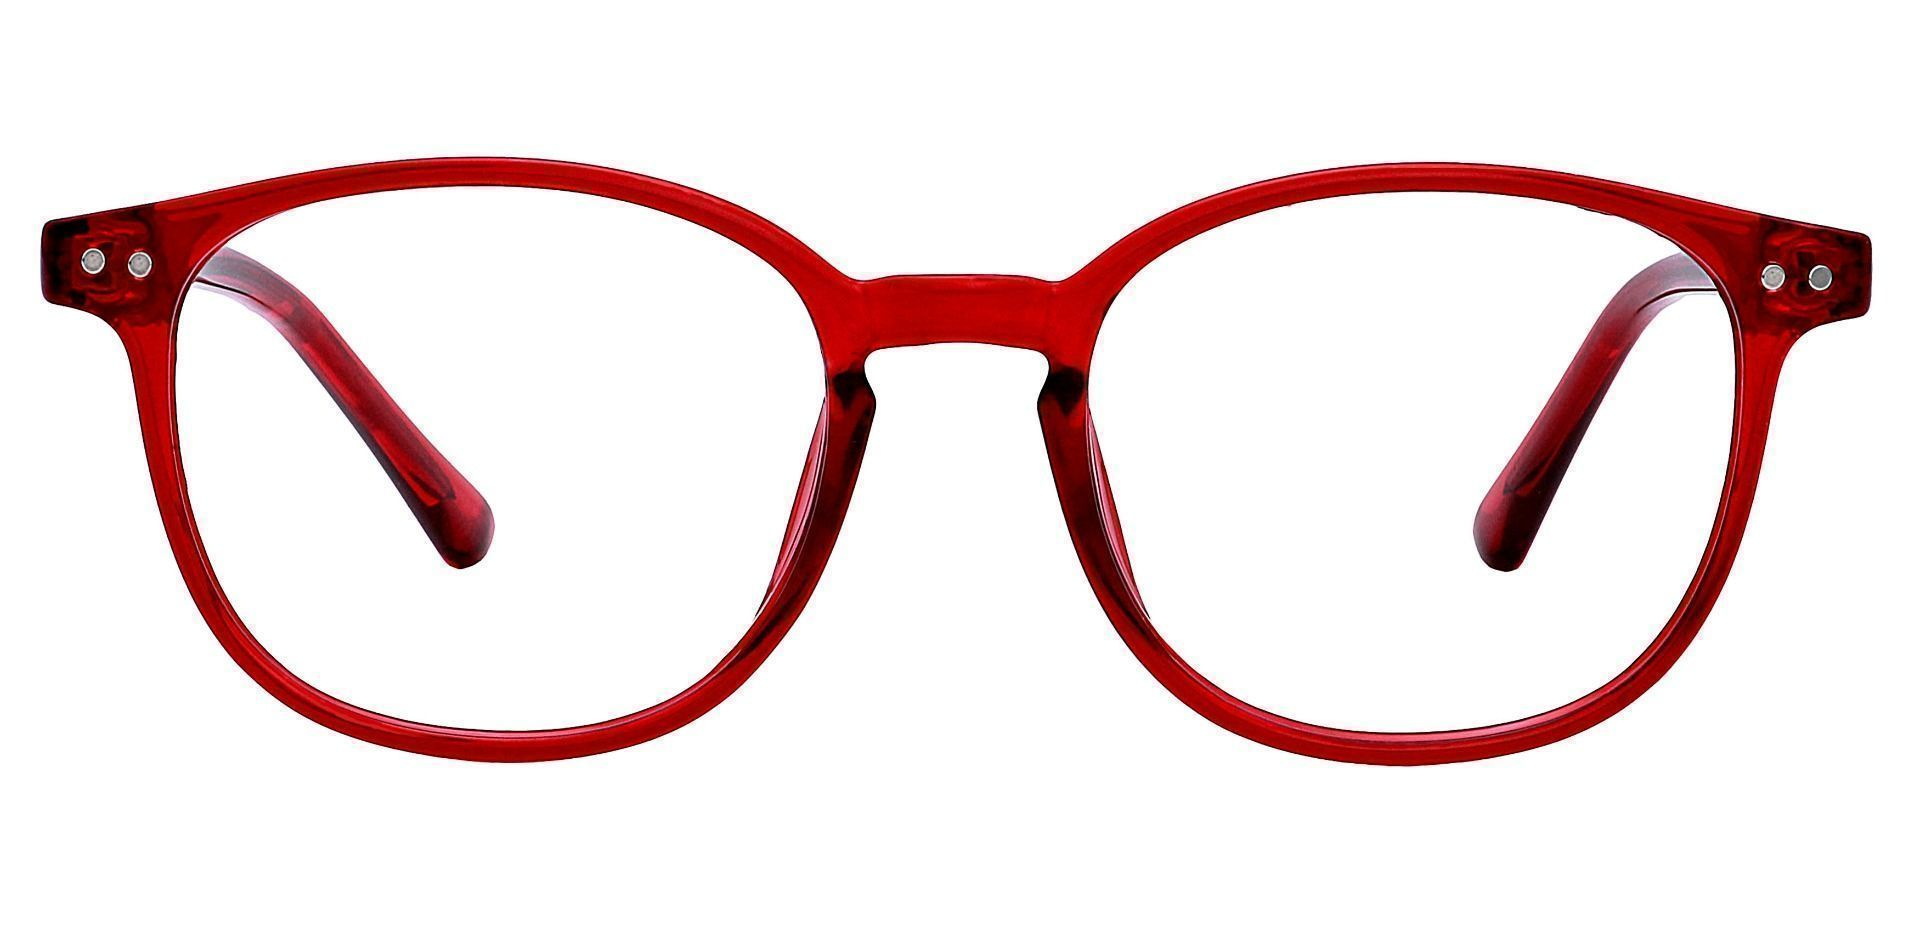 Holstein Oval Prescription Glasses - Red